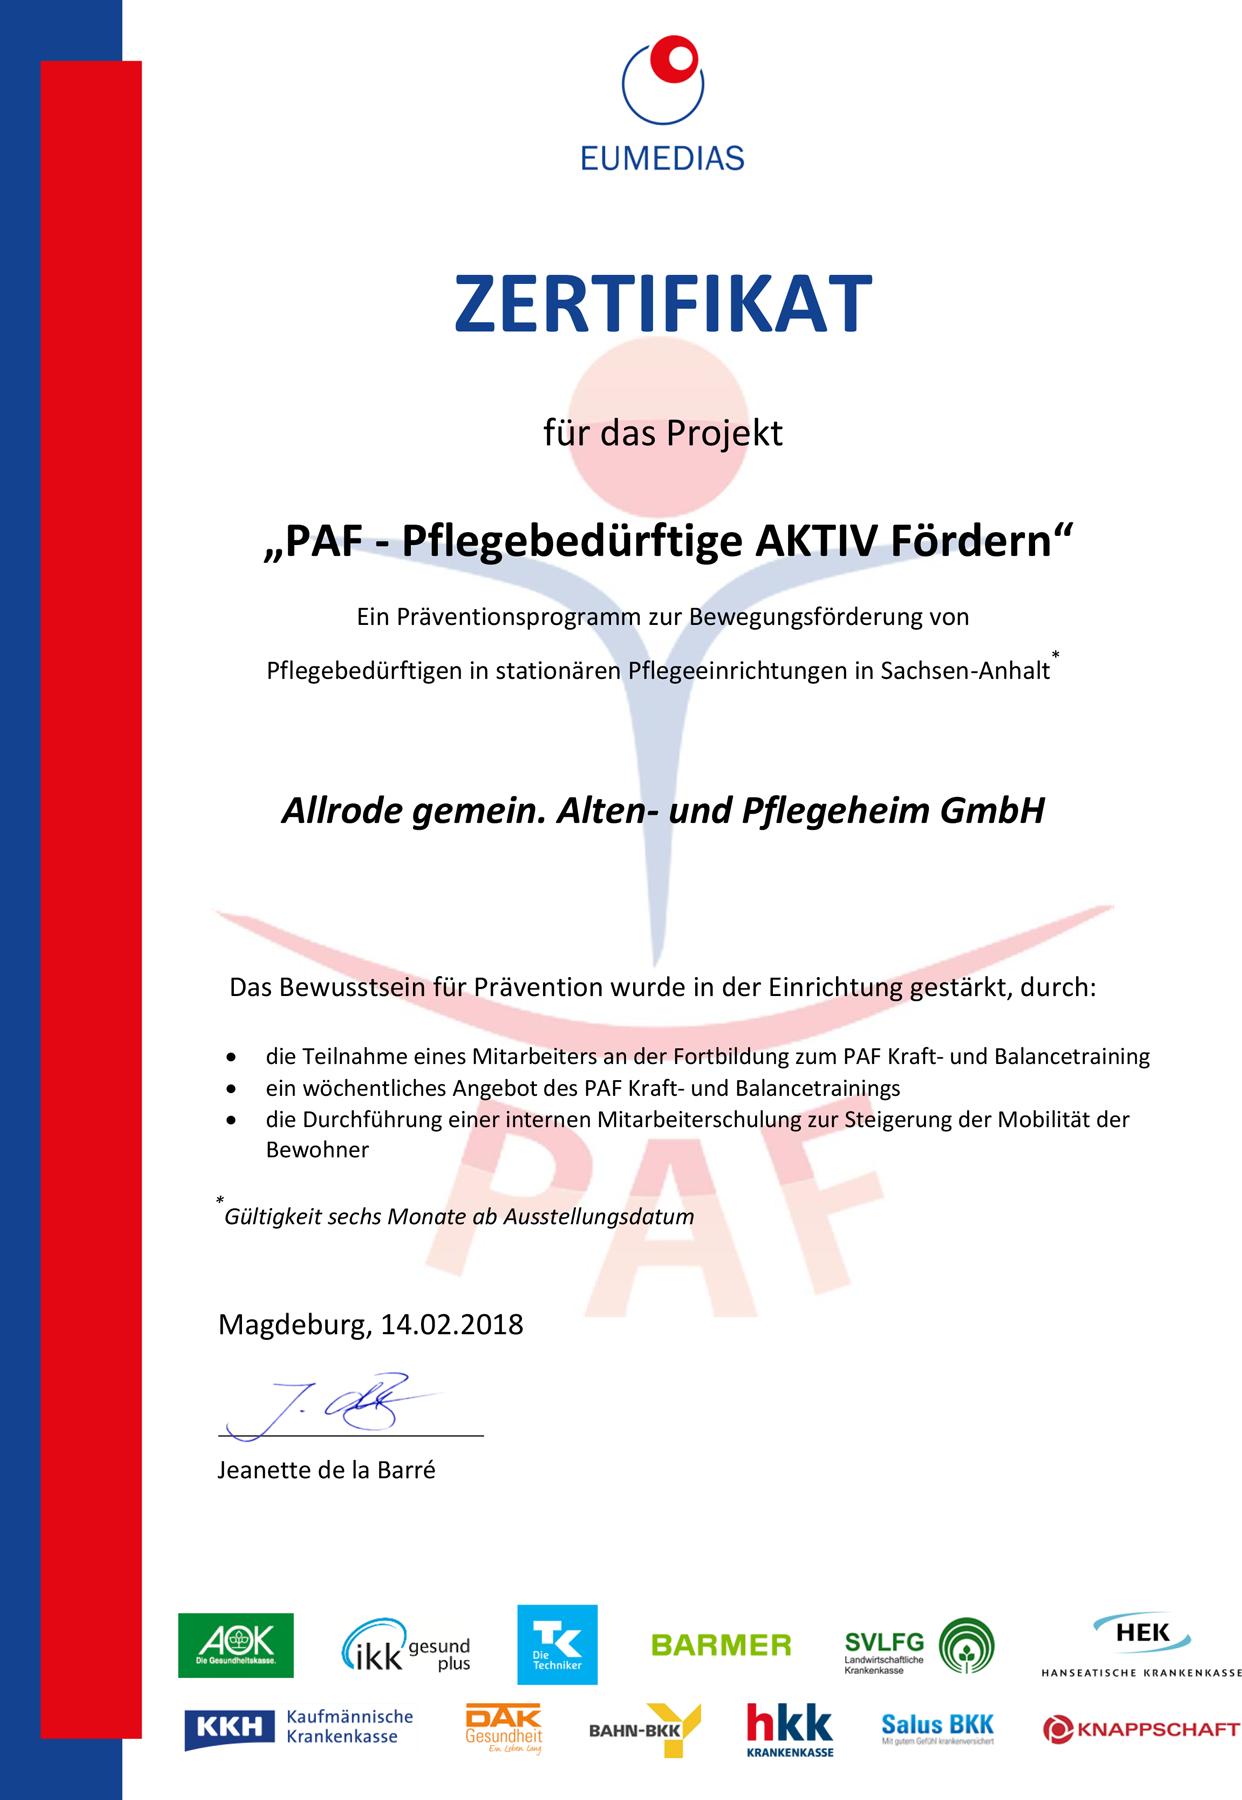 Zetifikat PAF - Pflegebedürftige AKTIV Fördern